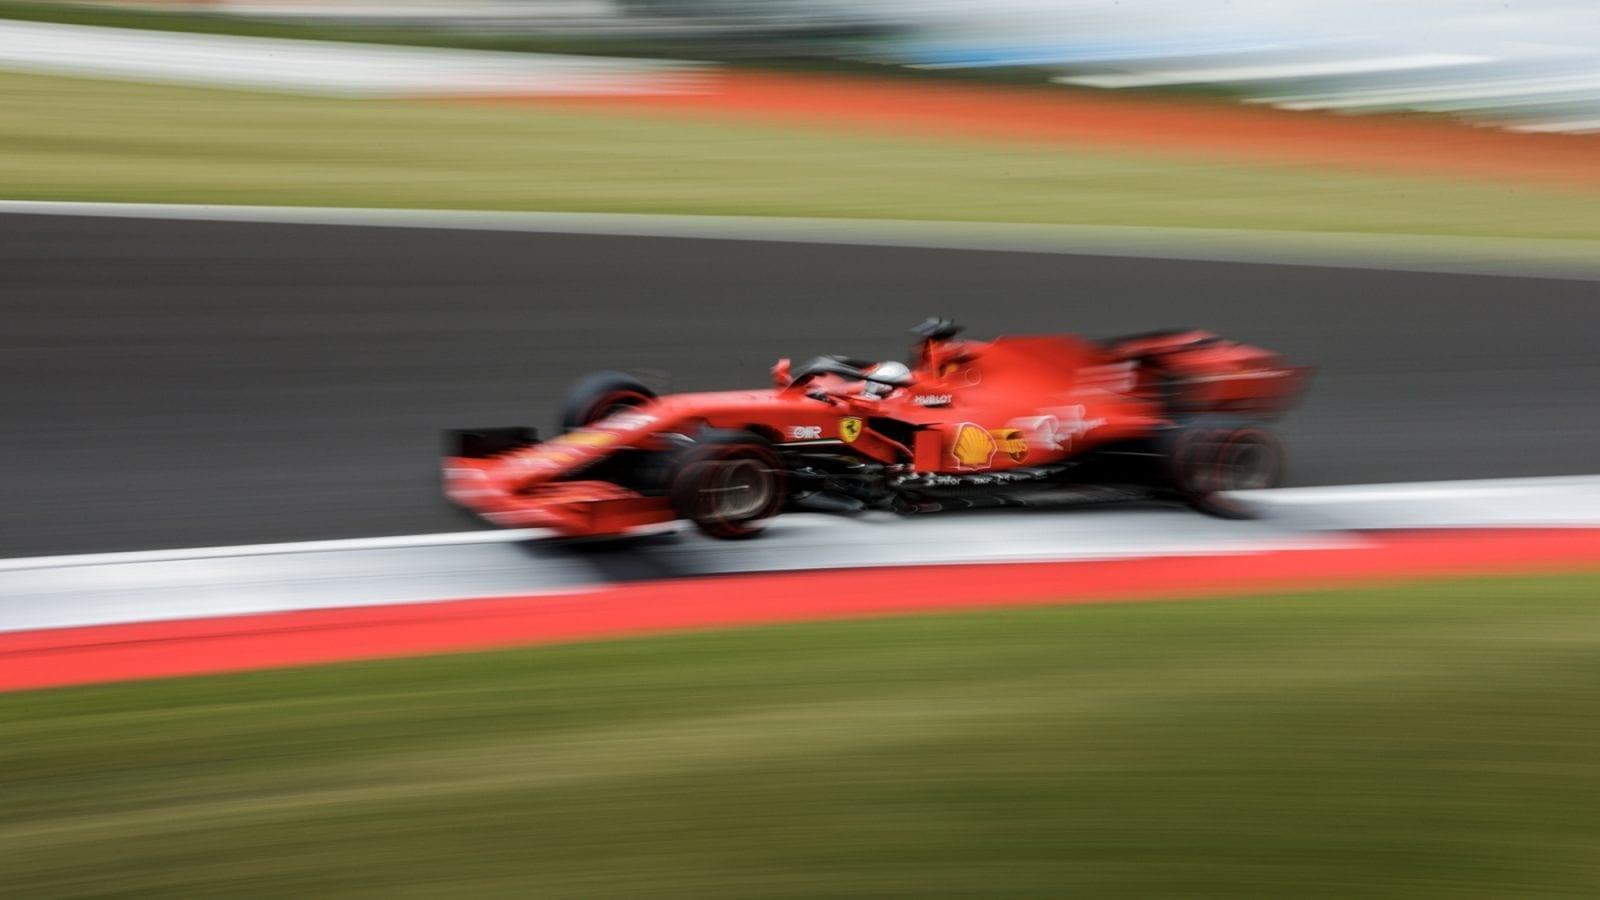 Blurred image of Sebastian Vettel's Ferrari during the 2020 British Grand Prix at Silverstone